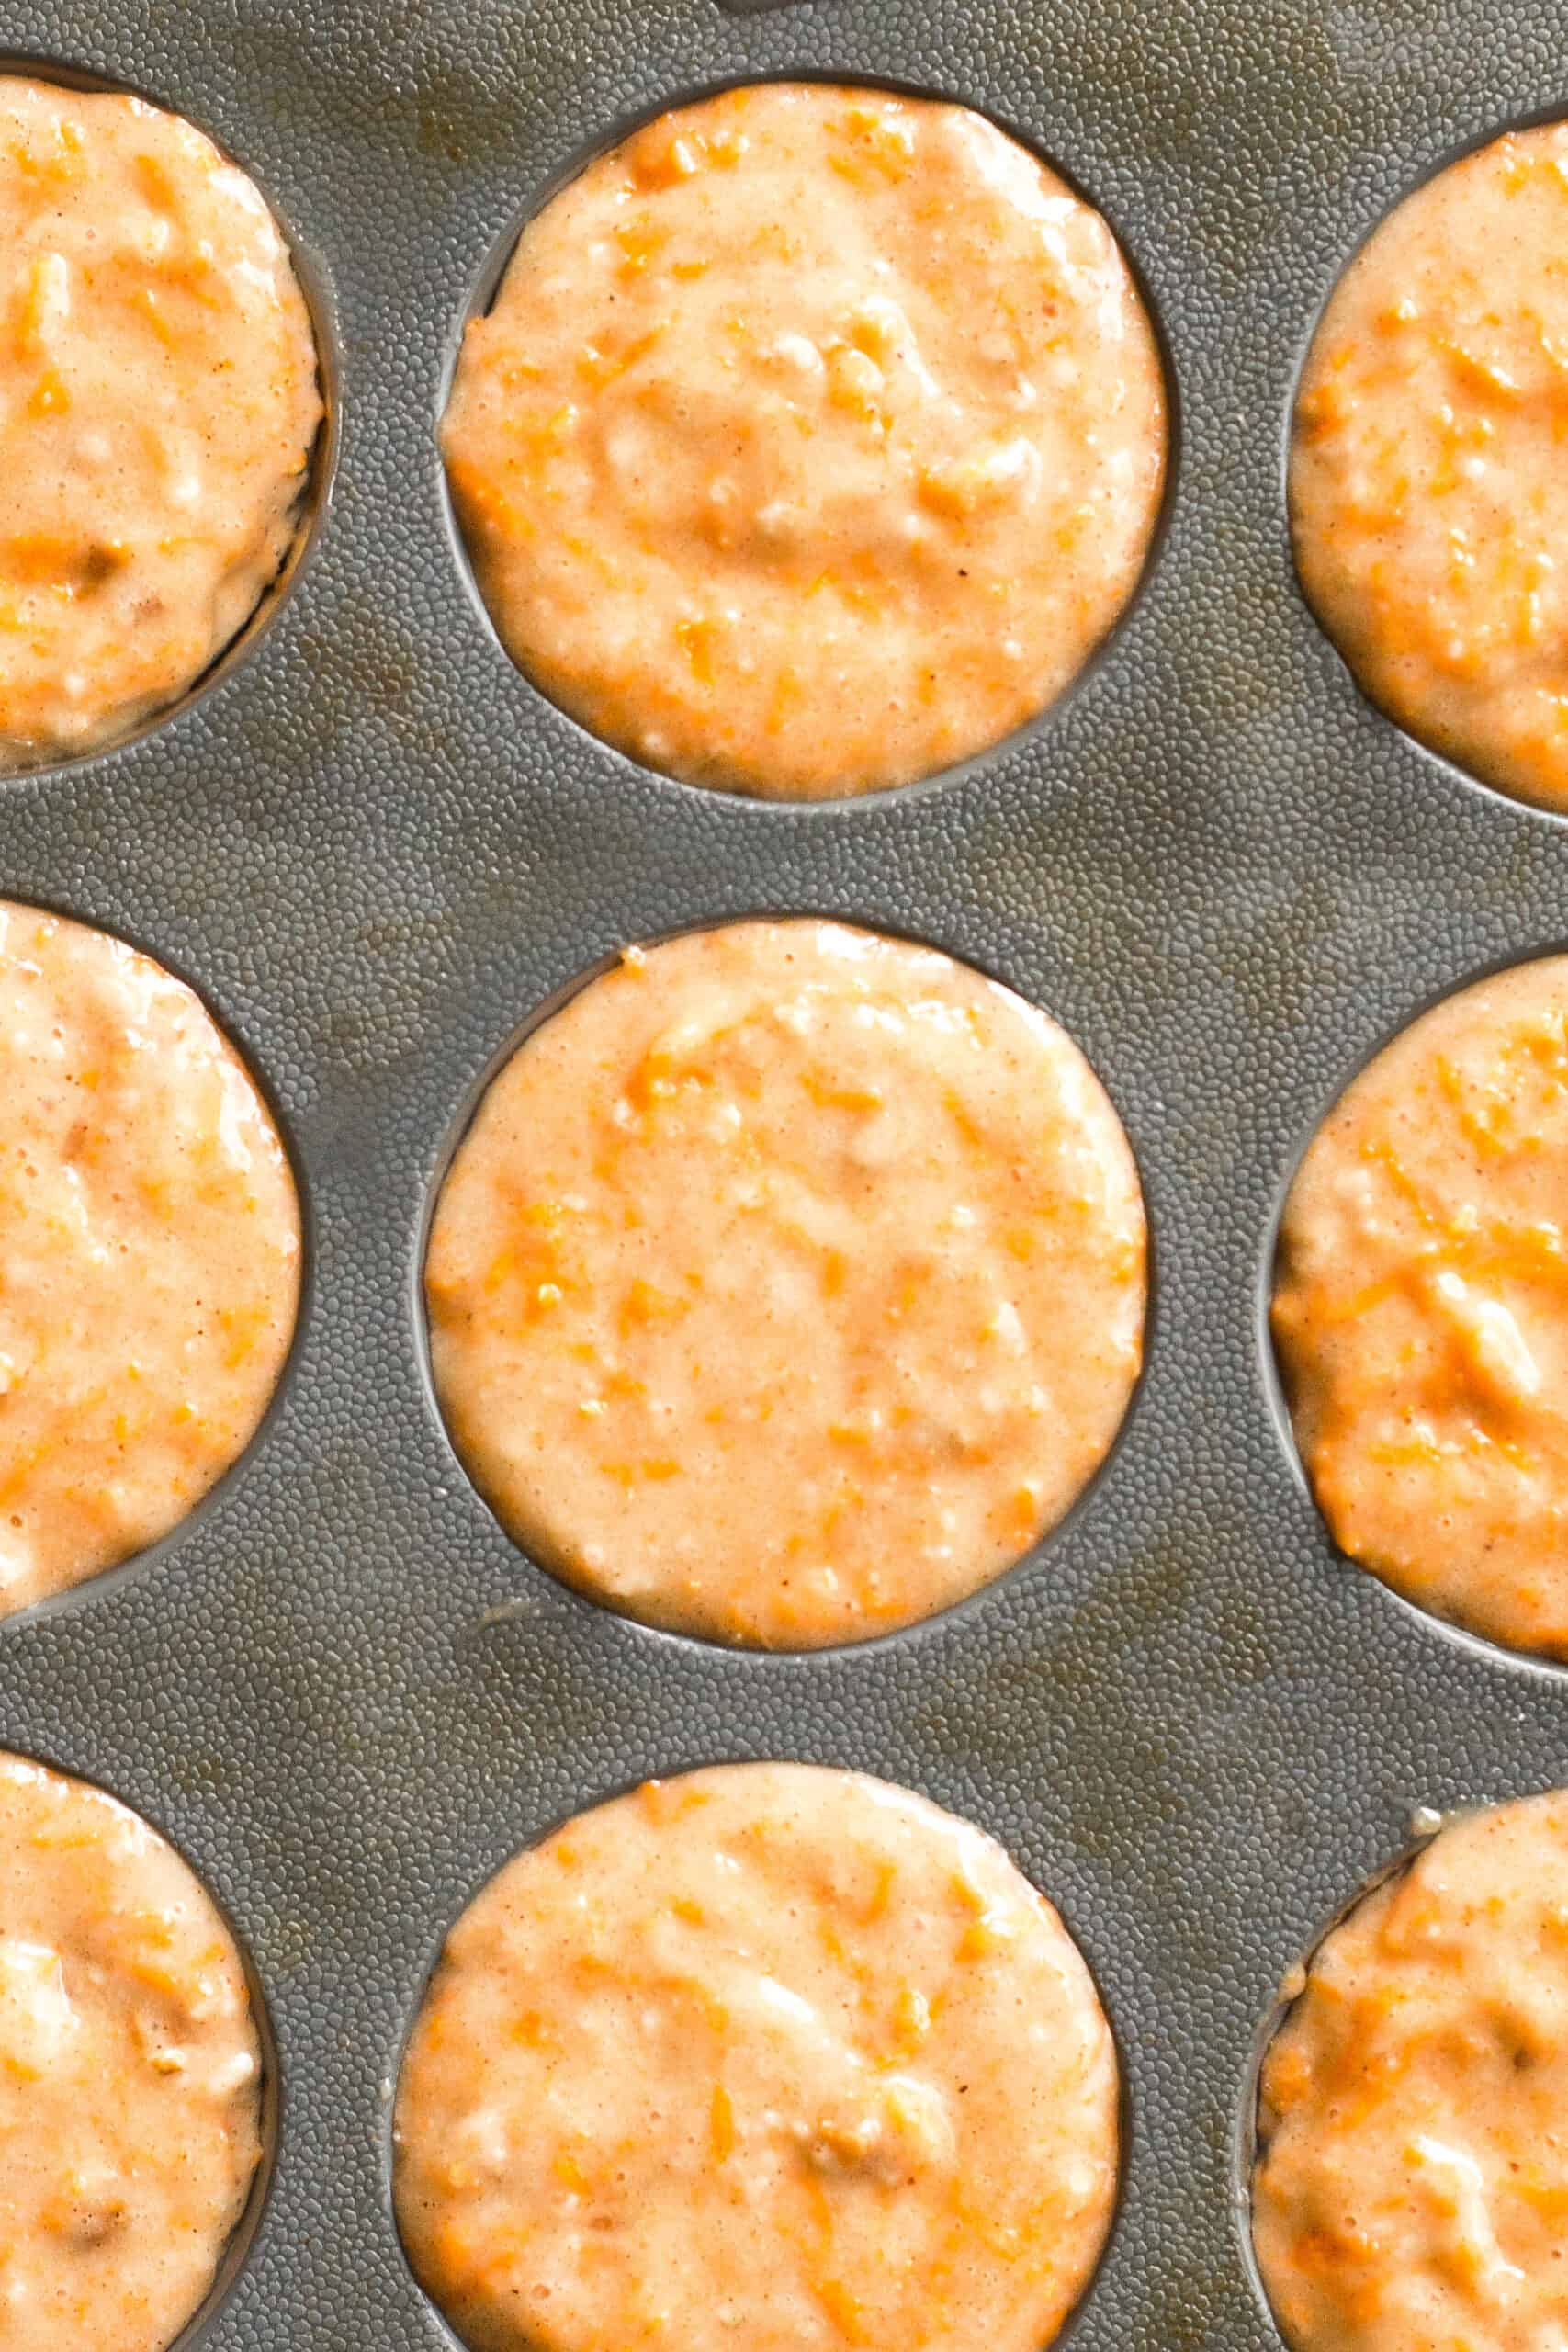 Carrot cake muffin batter in muffin mold.